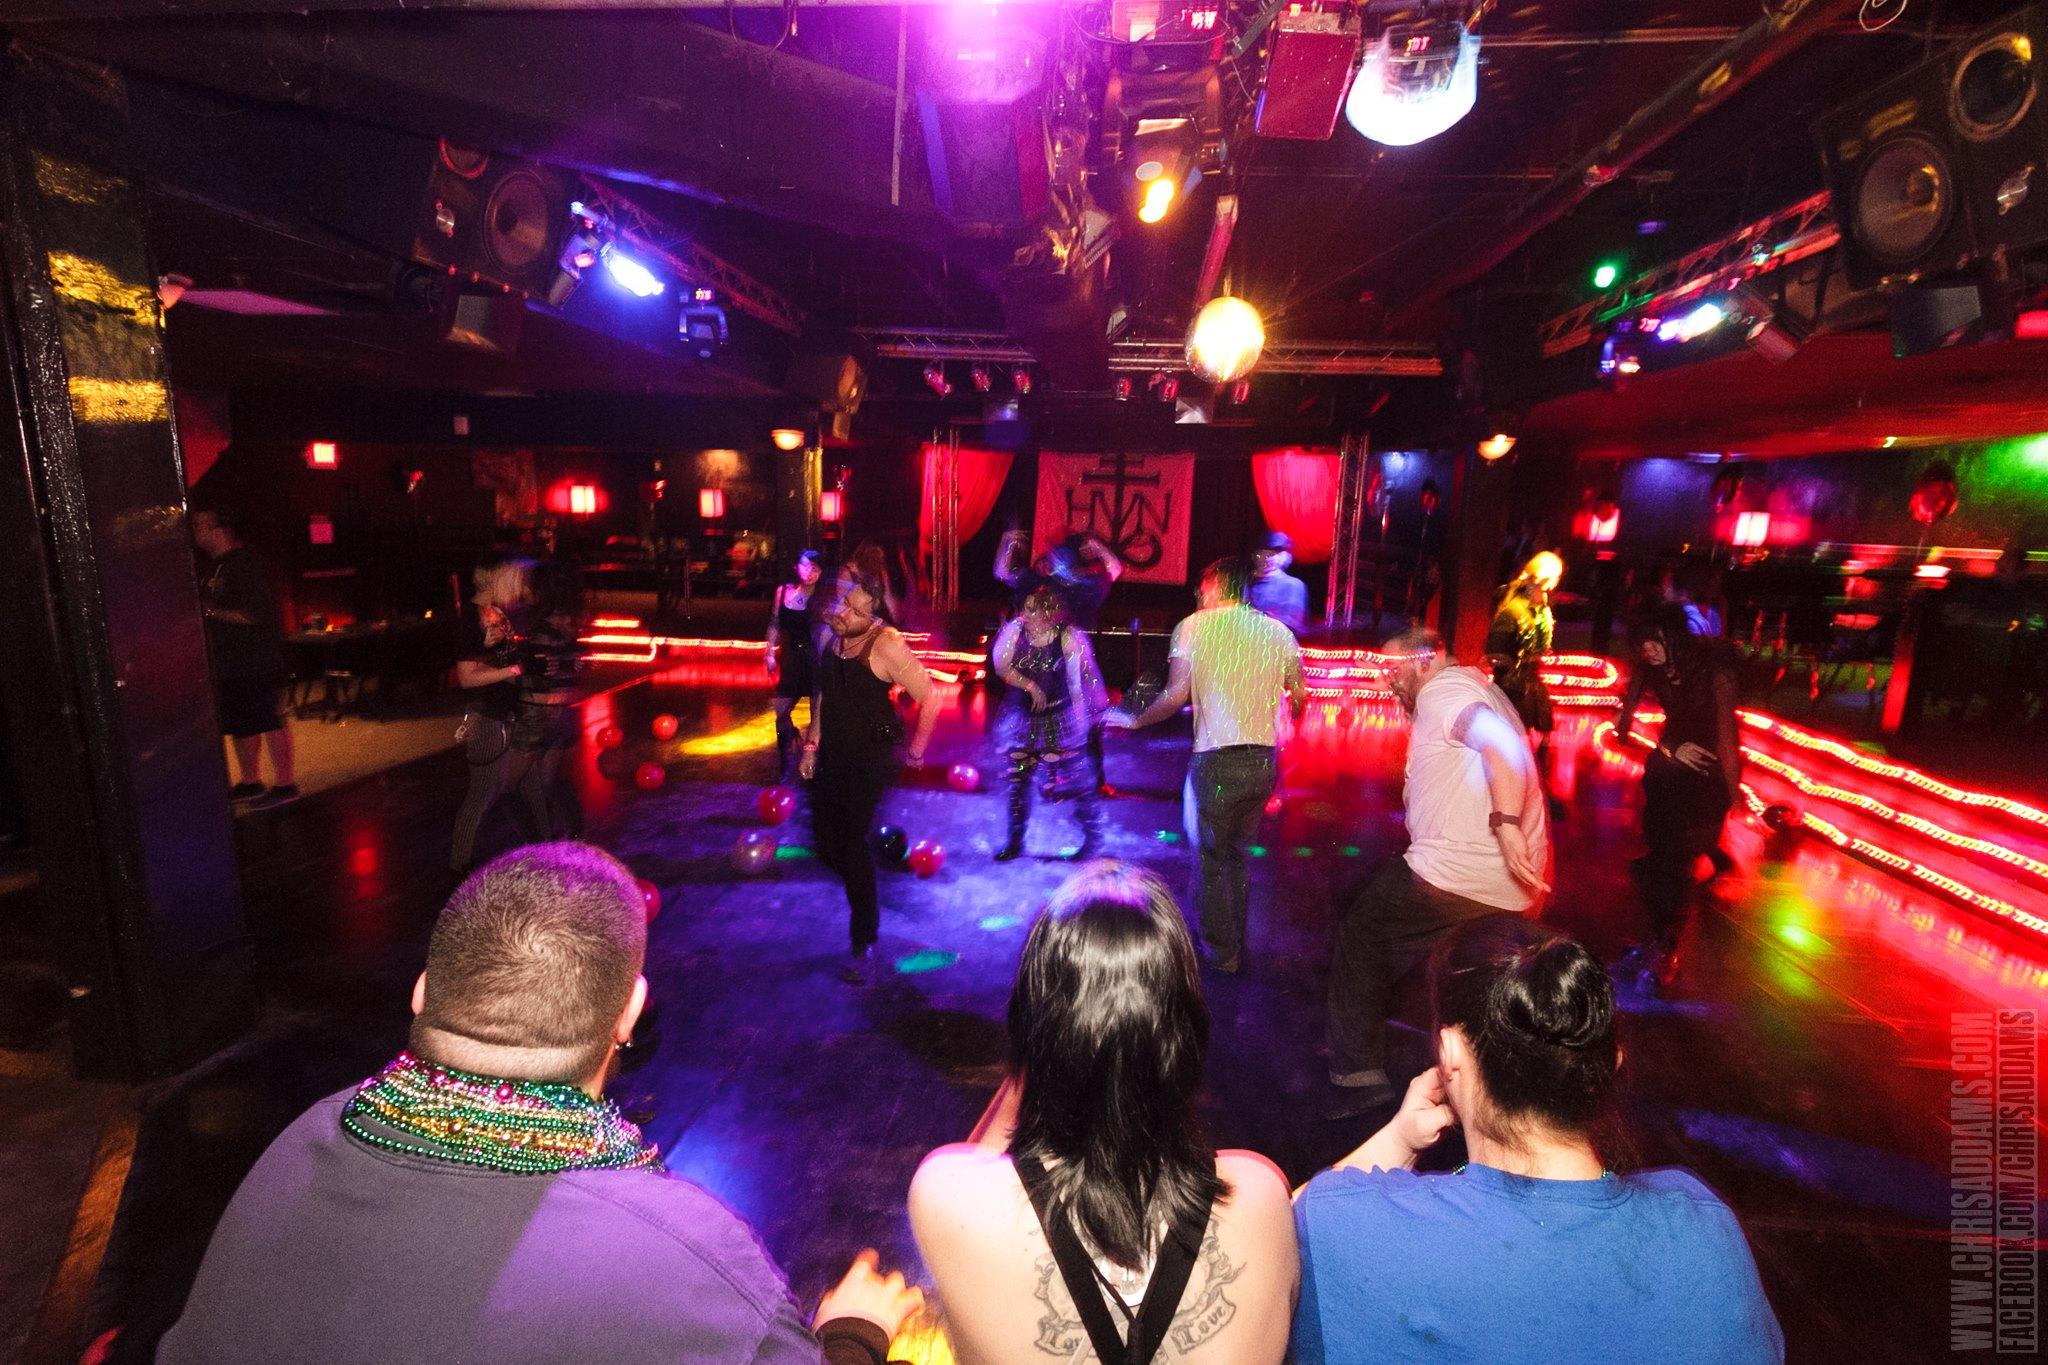 TheHavenClub-Goth-Industrial-Dance-Alternative-Northampton-MA (35).jpg